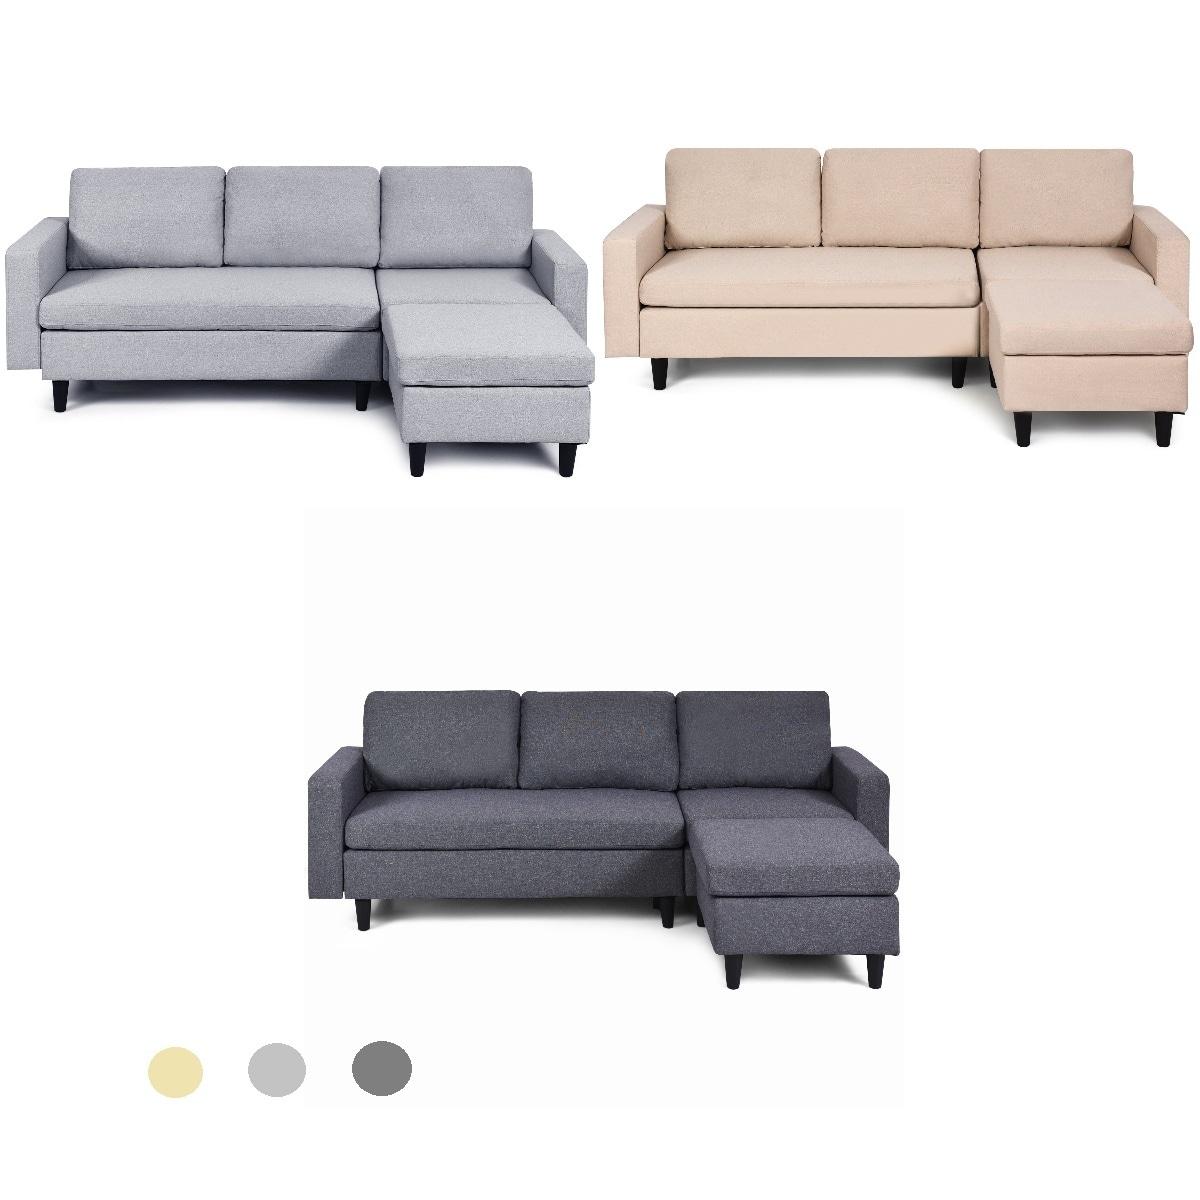 Costway Convertible Sectional Sofa